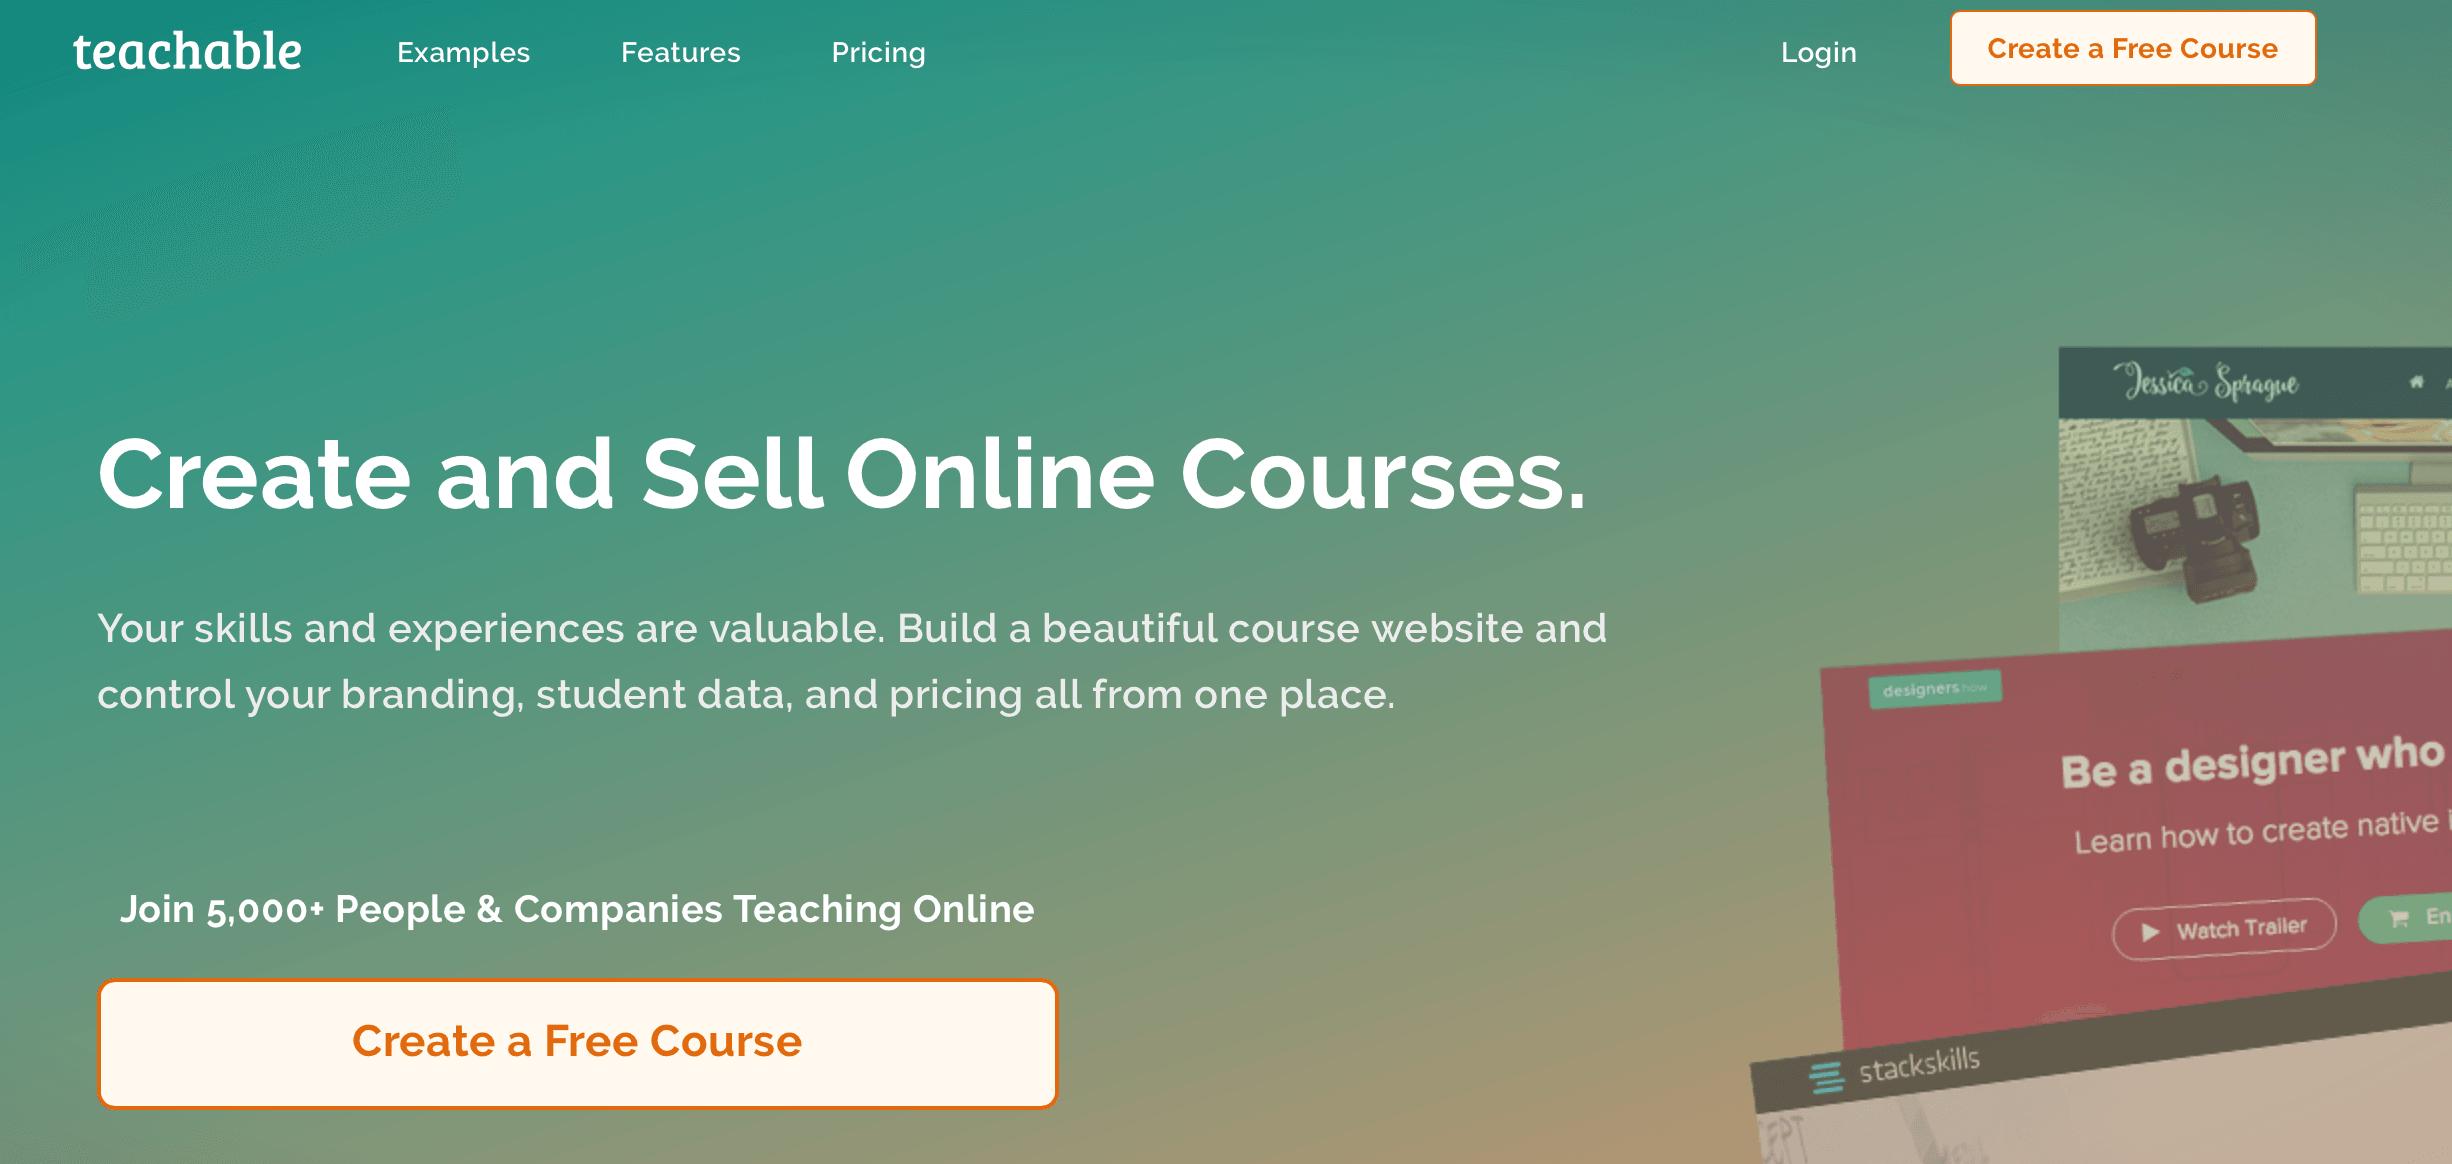 Colorzilla online - Teachable